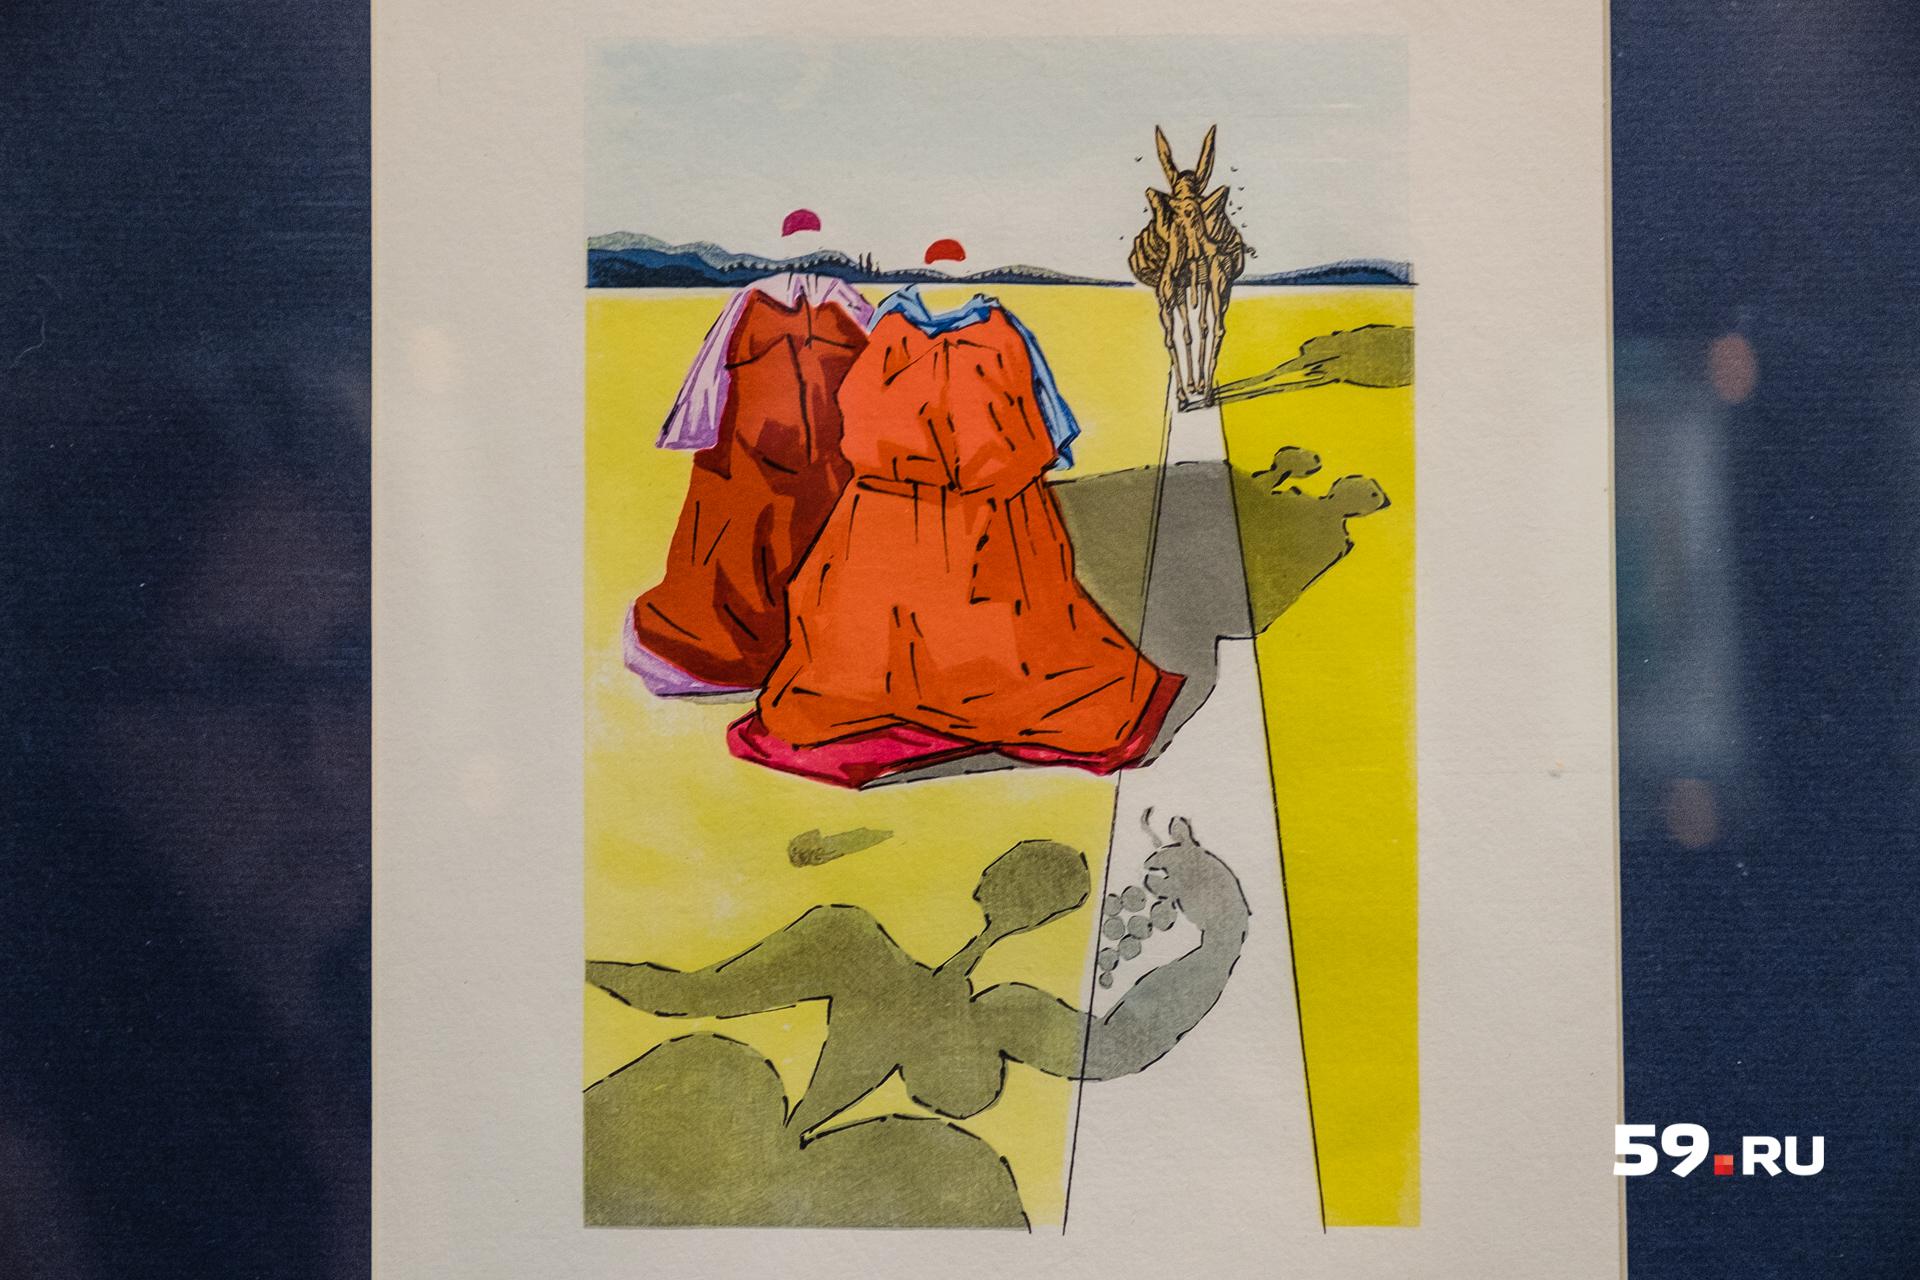 Иллюстрация к повести Педро де Аларкона «Треуголка»